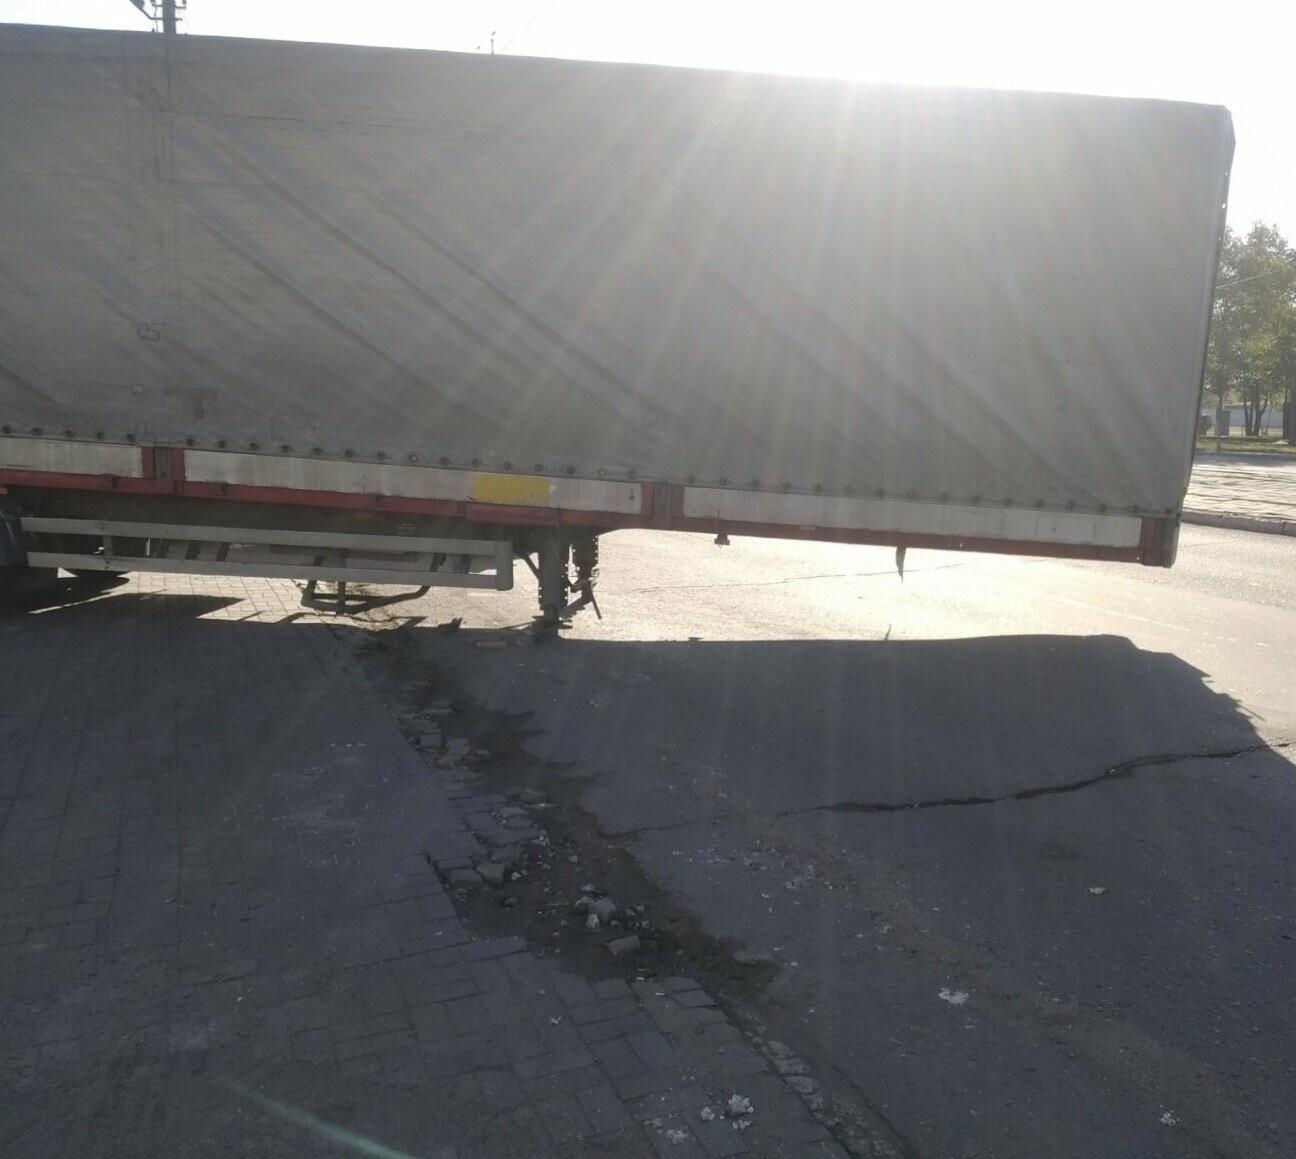 В Мариуполе прицеп оторвался у грузовика и перекрыл дорогу, - ФОТО, ВИДЕО, фото-2